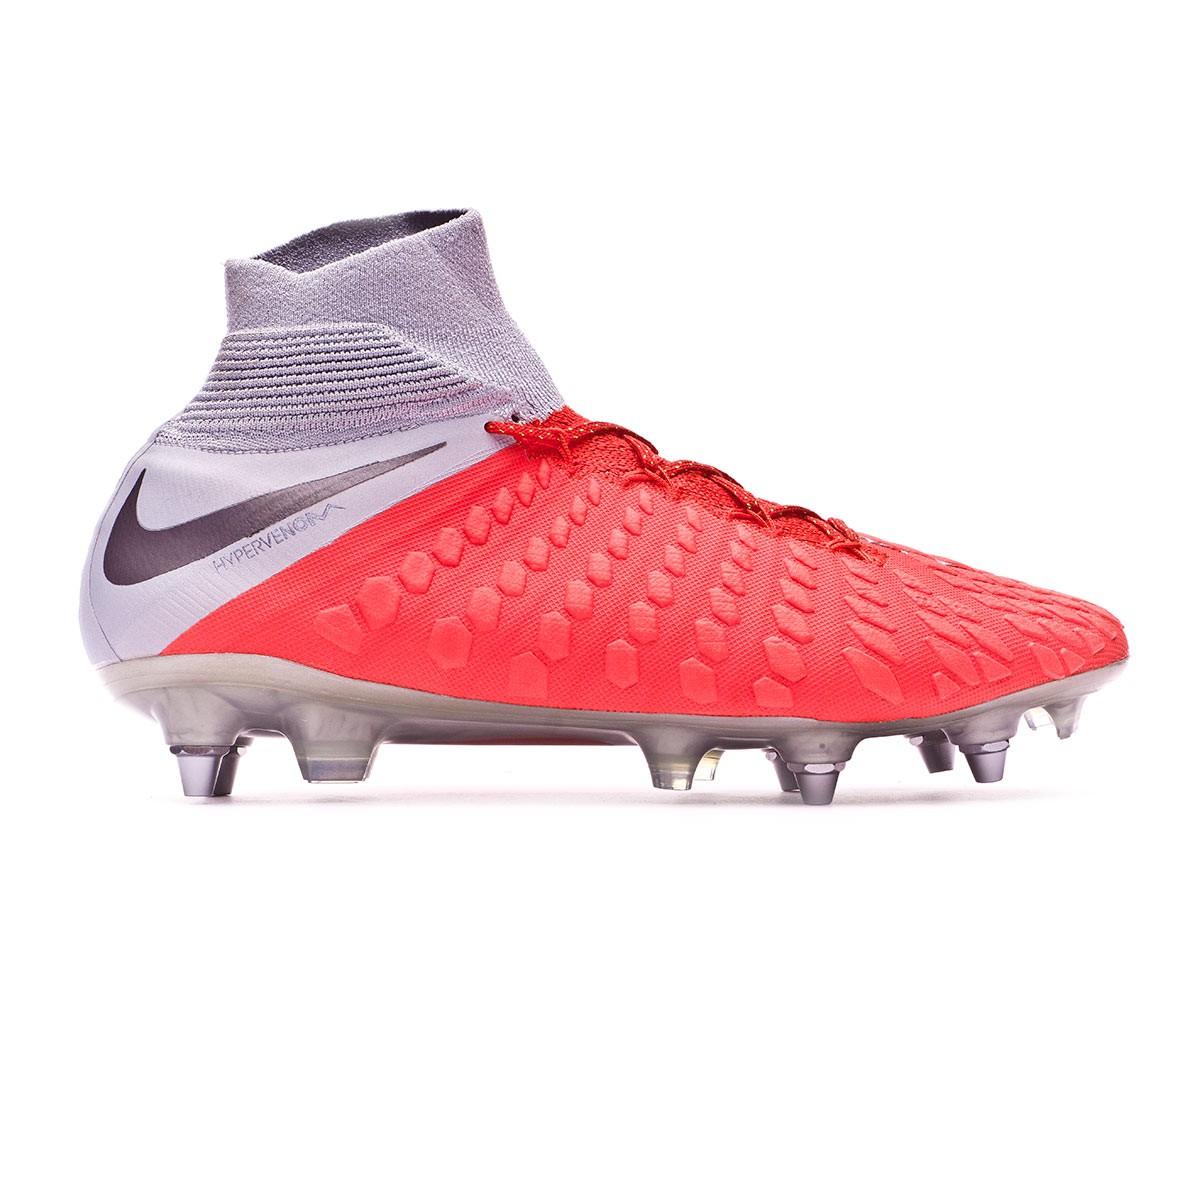 sale retailer e1c0f 5d82b Football Boots Nike Hypervenom Phantom III Elite DF Anti-Clog SG-Pro Light  crimson-Metallic dark grey-Wolf grey - Football store Fútbol Emotion